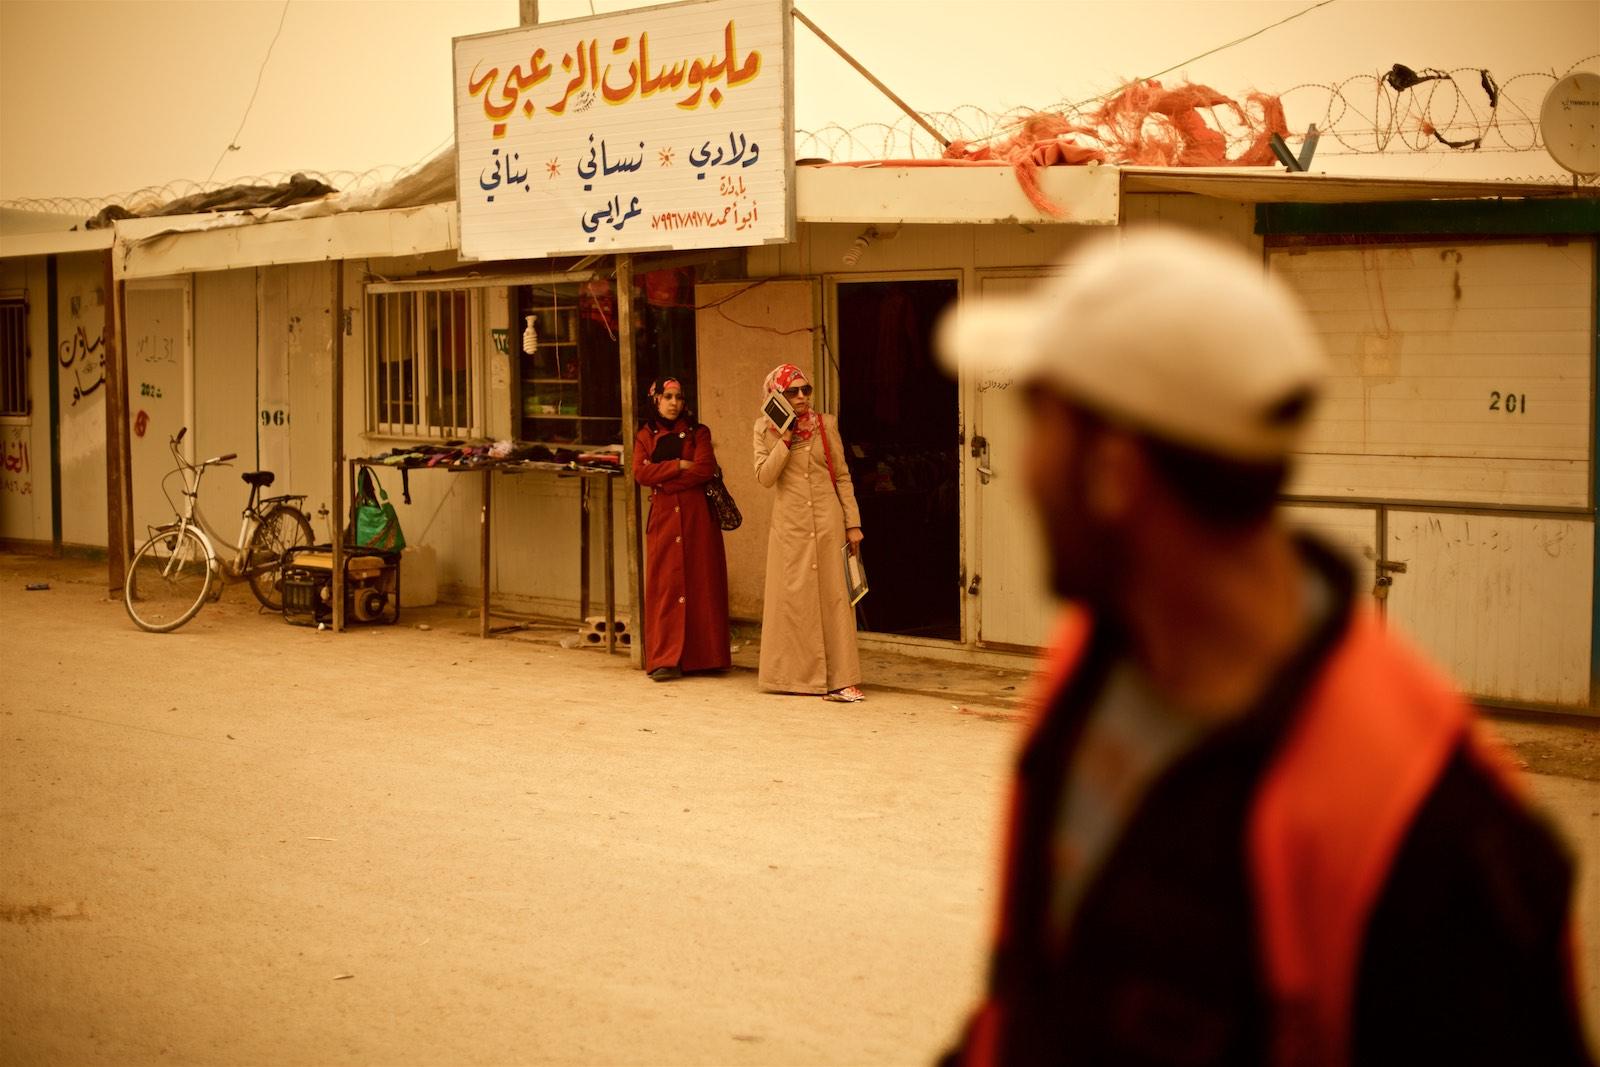 Scéna z hlavnej ulice v tábore Zaatari, Jordánsko  (photo: Denis Bosnic)